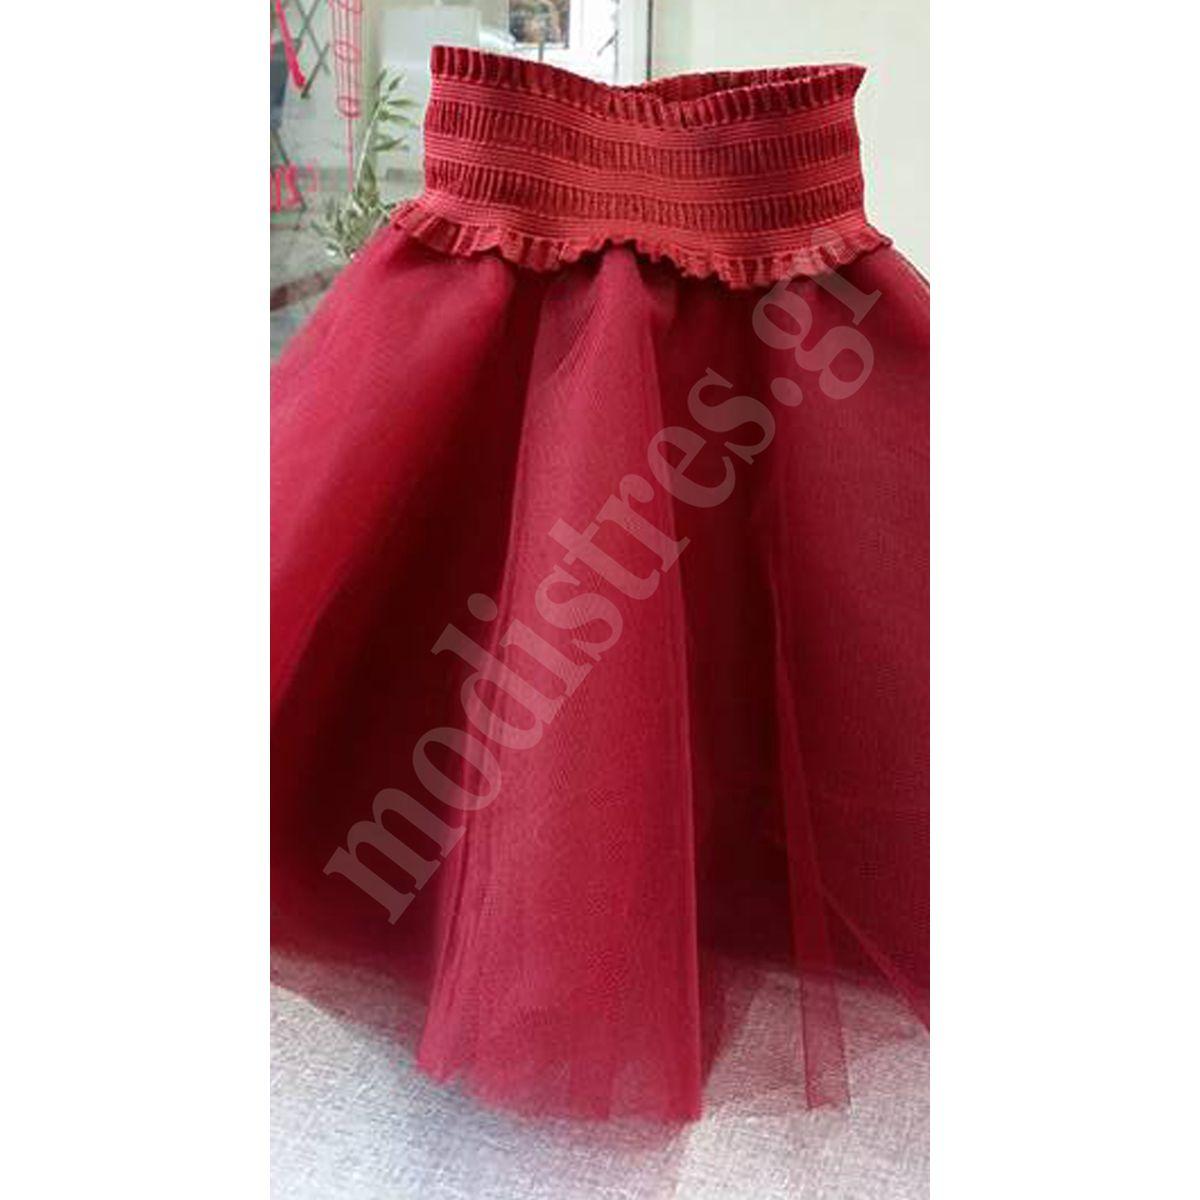 fd247af5897 Παιδική Τούλινη φούστα Κόκκινη – MODISTRES.COM